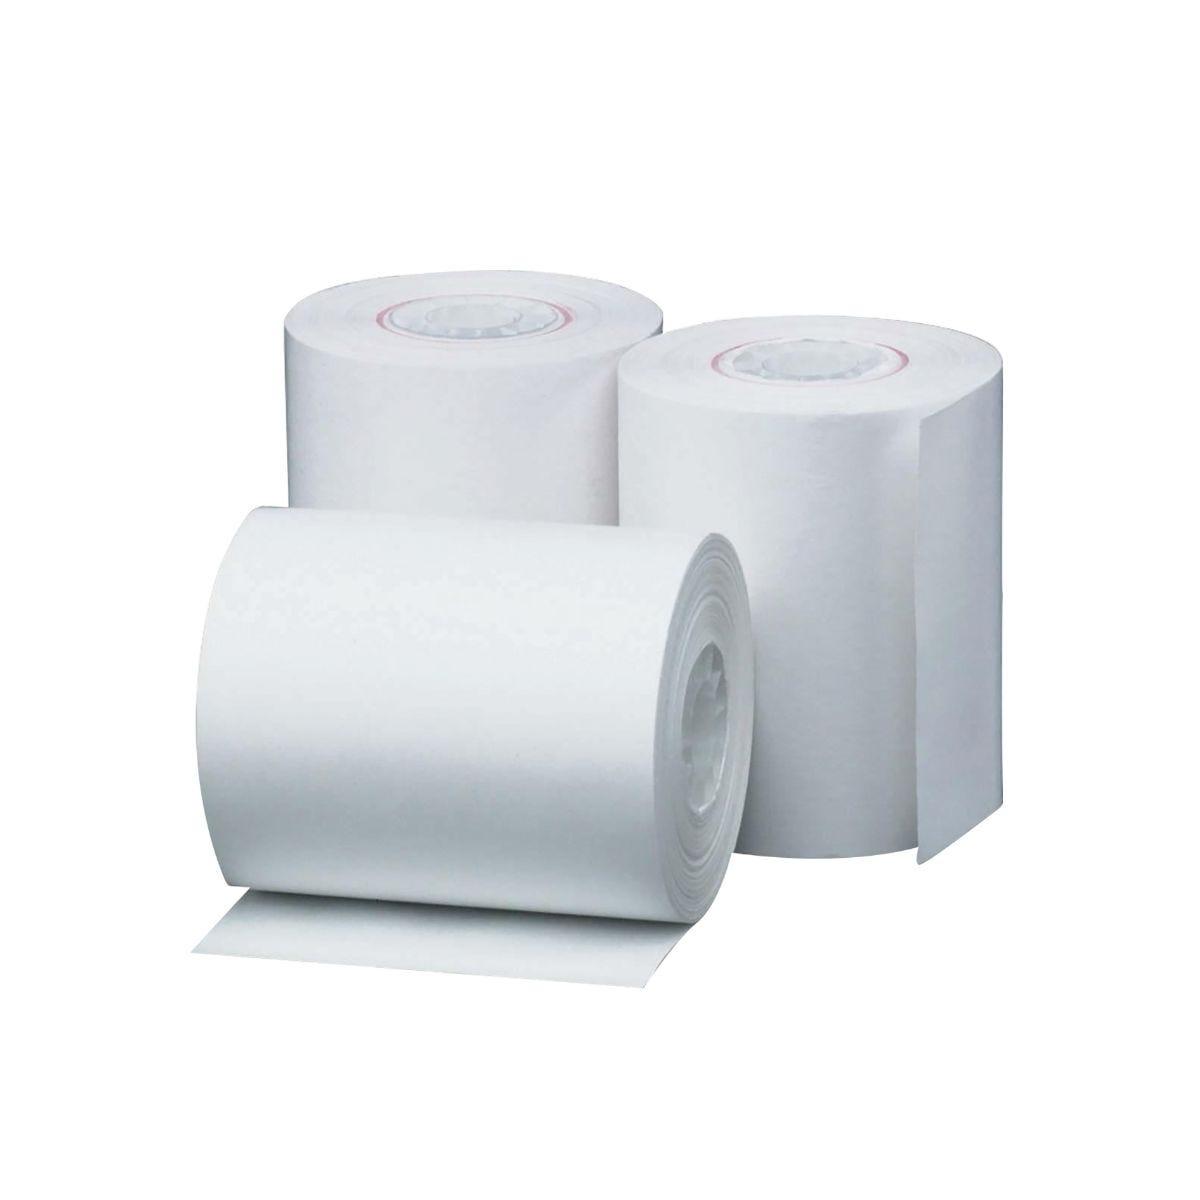 Prestige Cash Register Till Roll 1-Ply L40m x W44mm Pack of 20, White